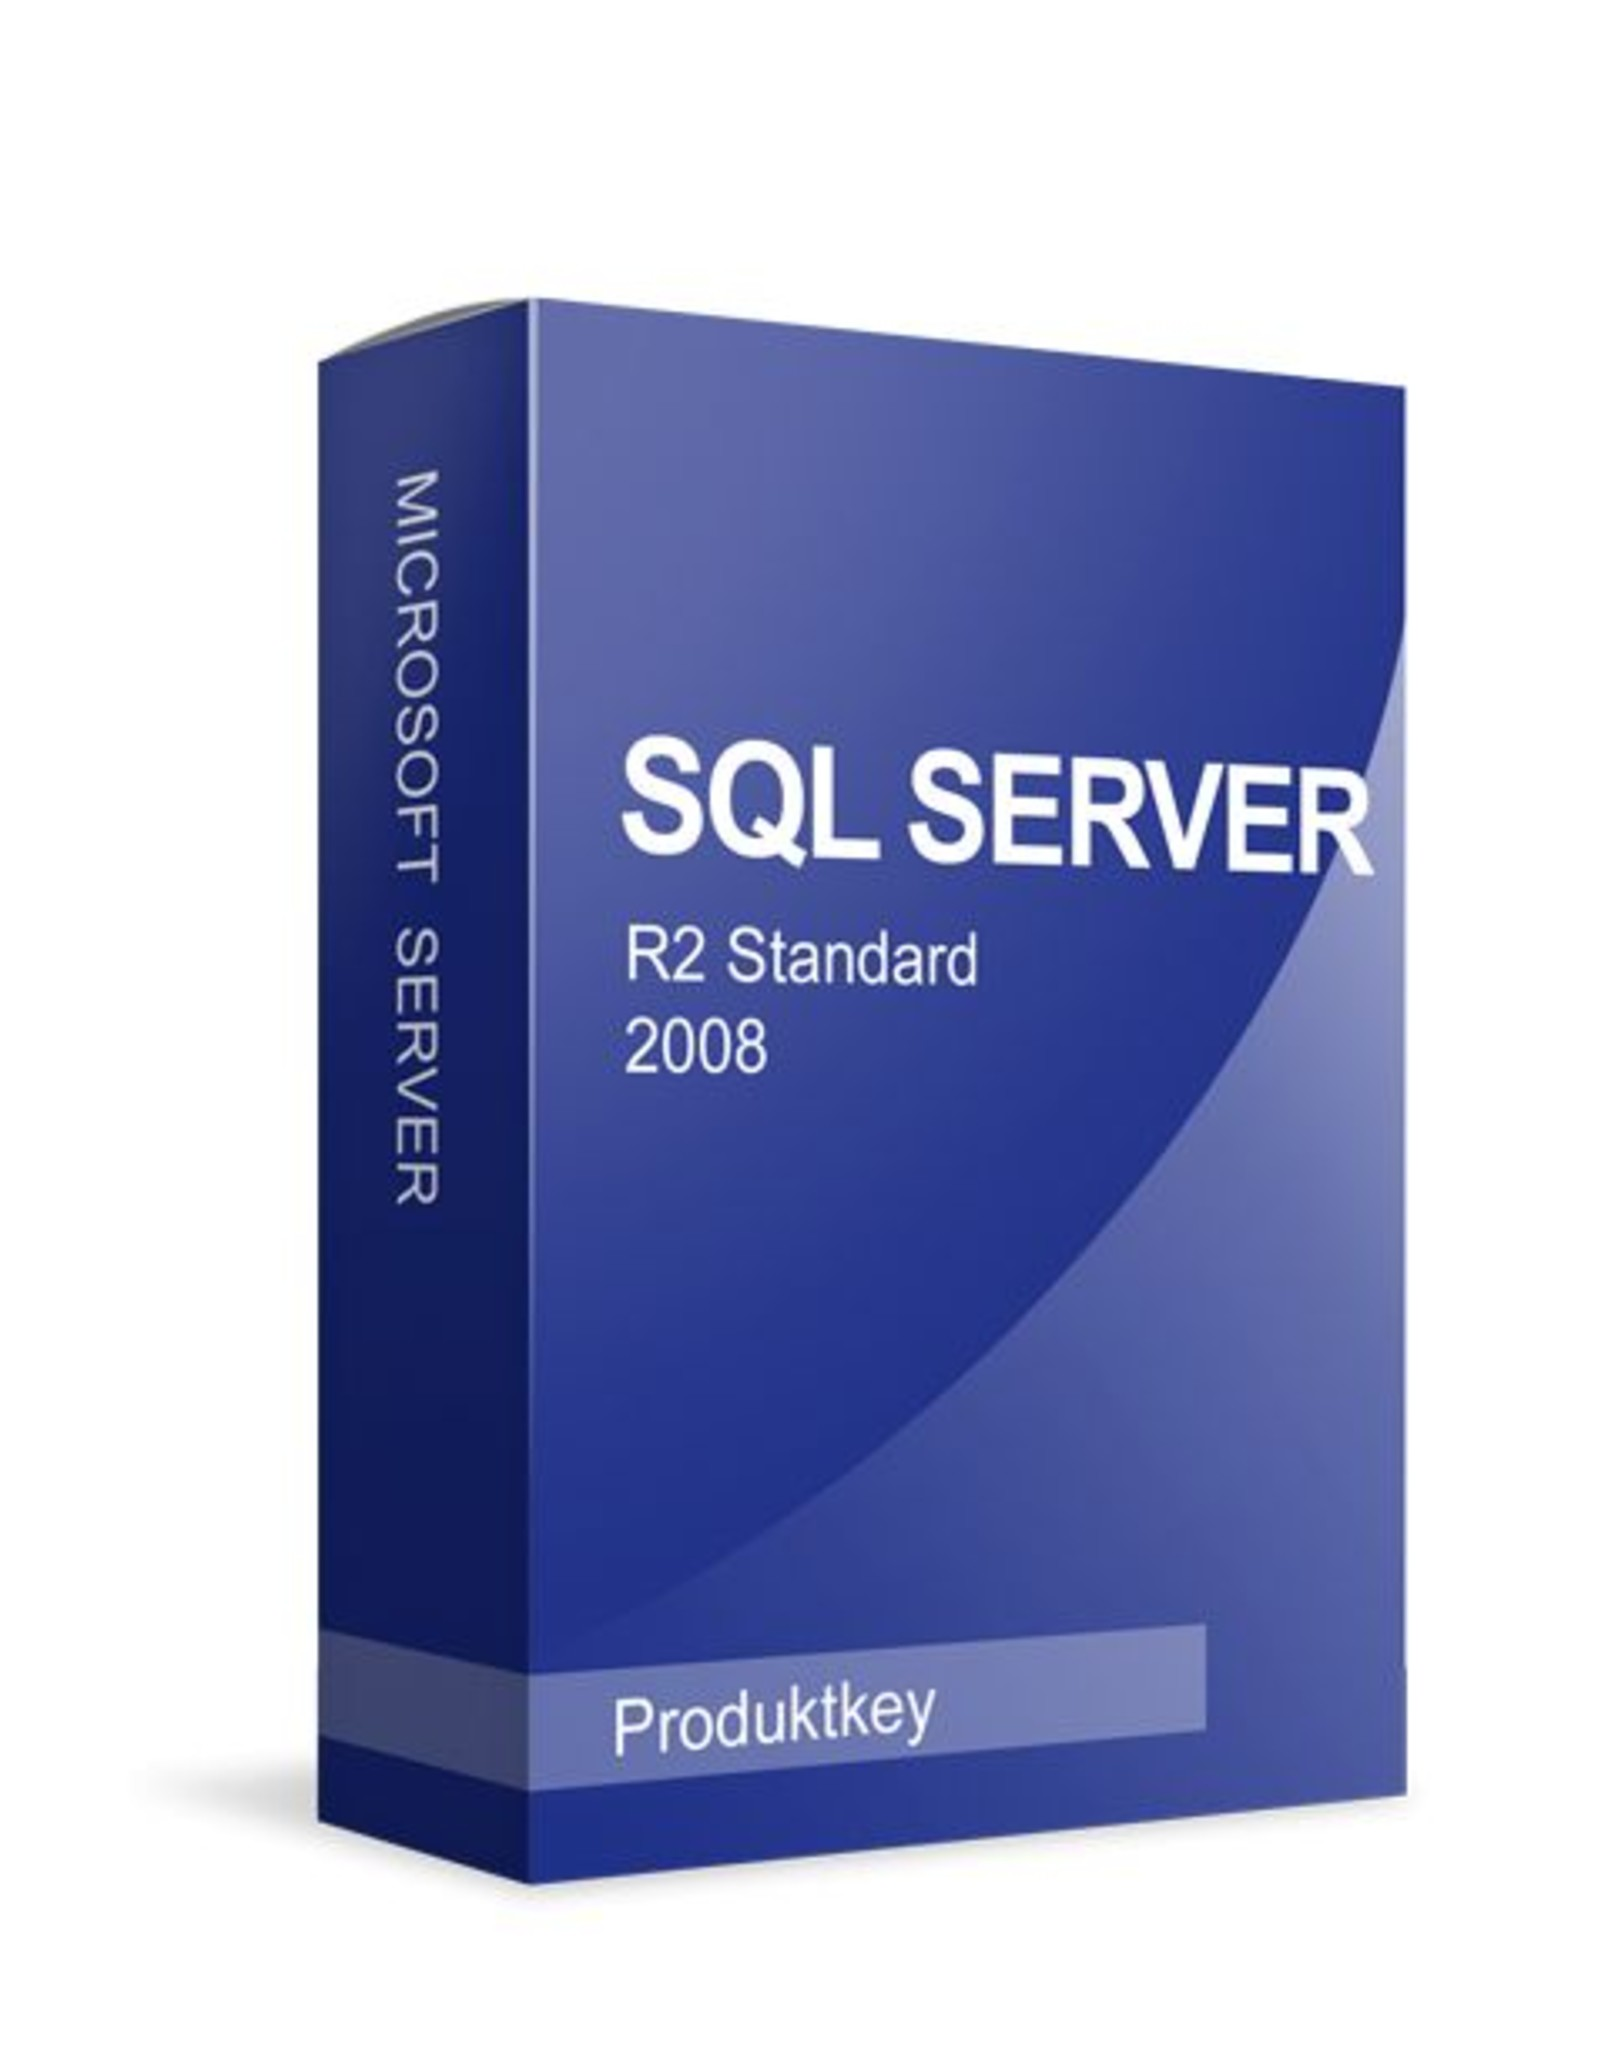 Microsoft Microsoft SQL Server 2008 R2 Standard